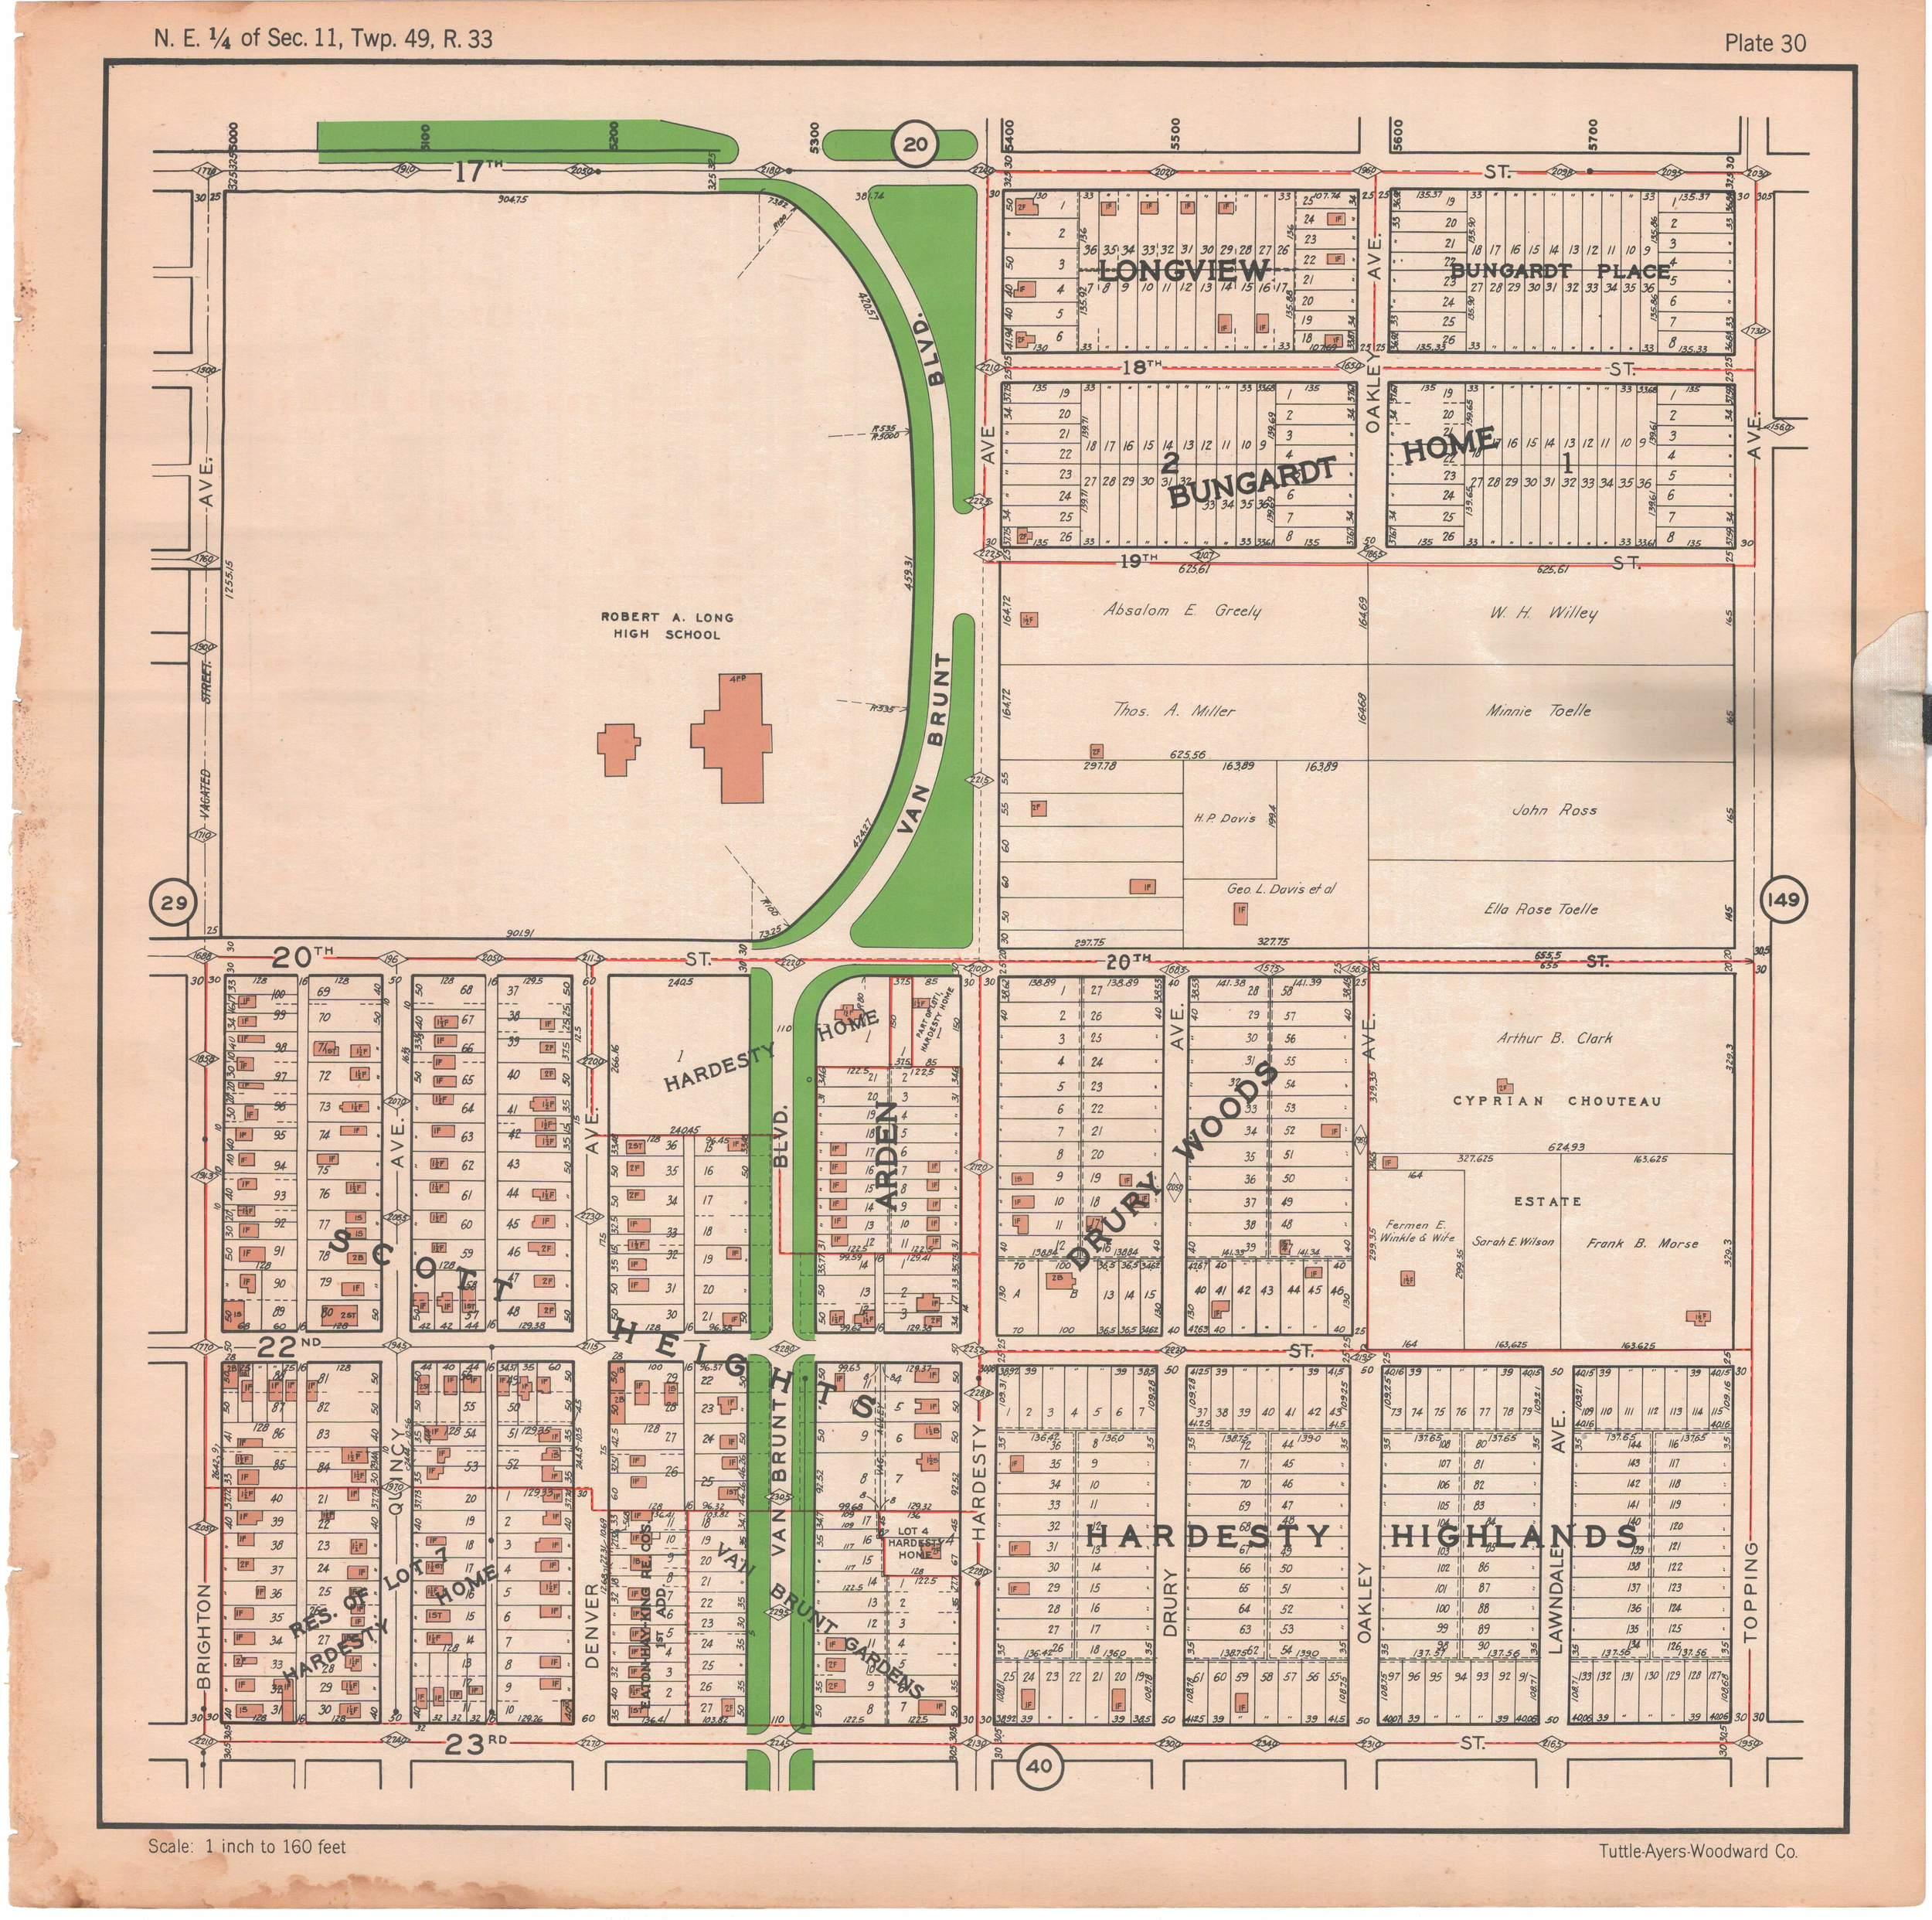 1925 TUTTLE_AYERS_Plate 30.JPG